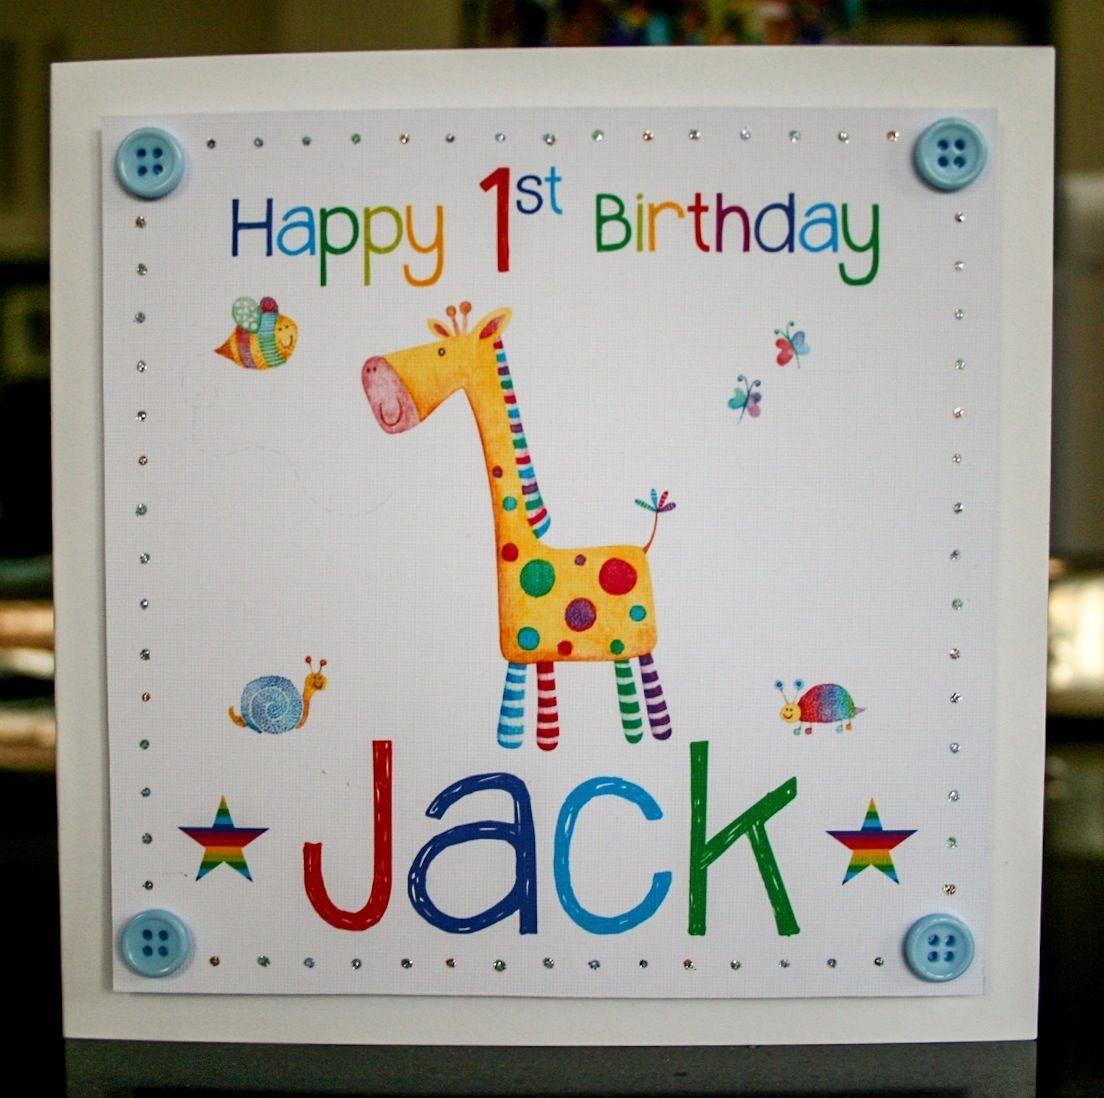 Handmade personalised 1st birthday card by michaela de latour handmade personalised 1st birthday card by michaela de latour bookmarktalkfo Images